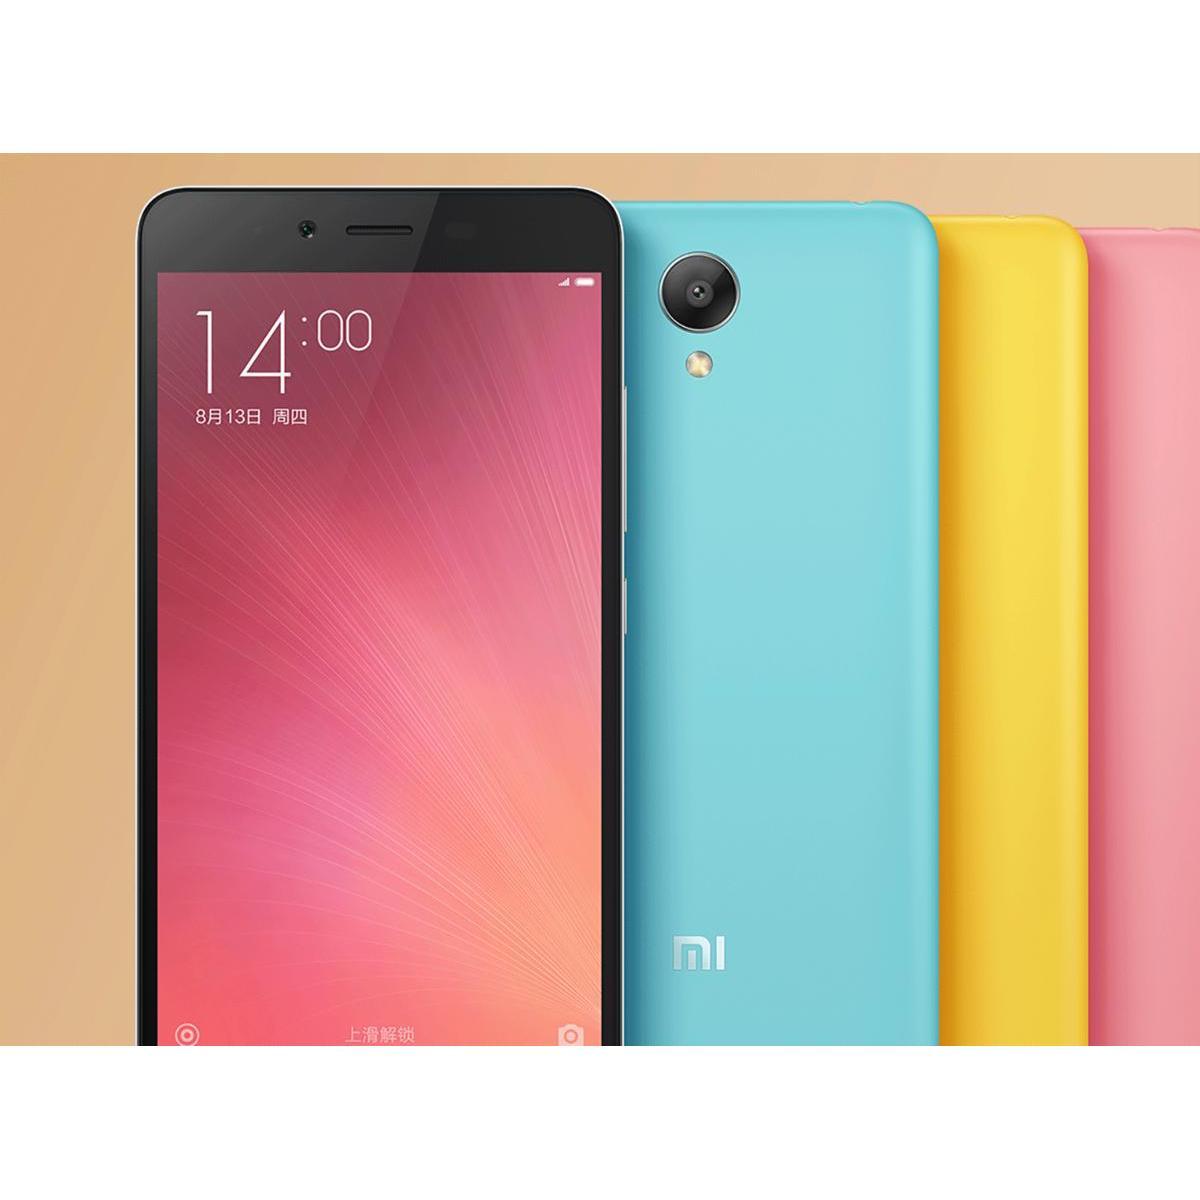 Jual Xiaomi Redmi Note 2 4G Dual Sim 20 GHz HELIO